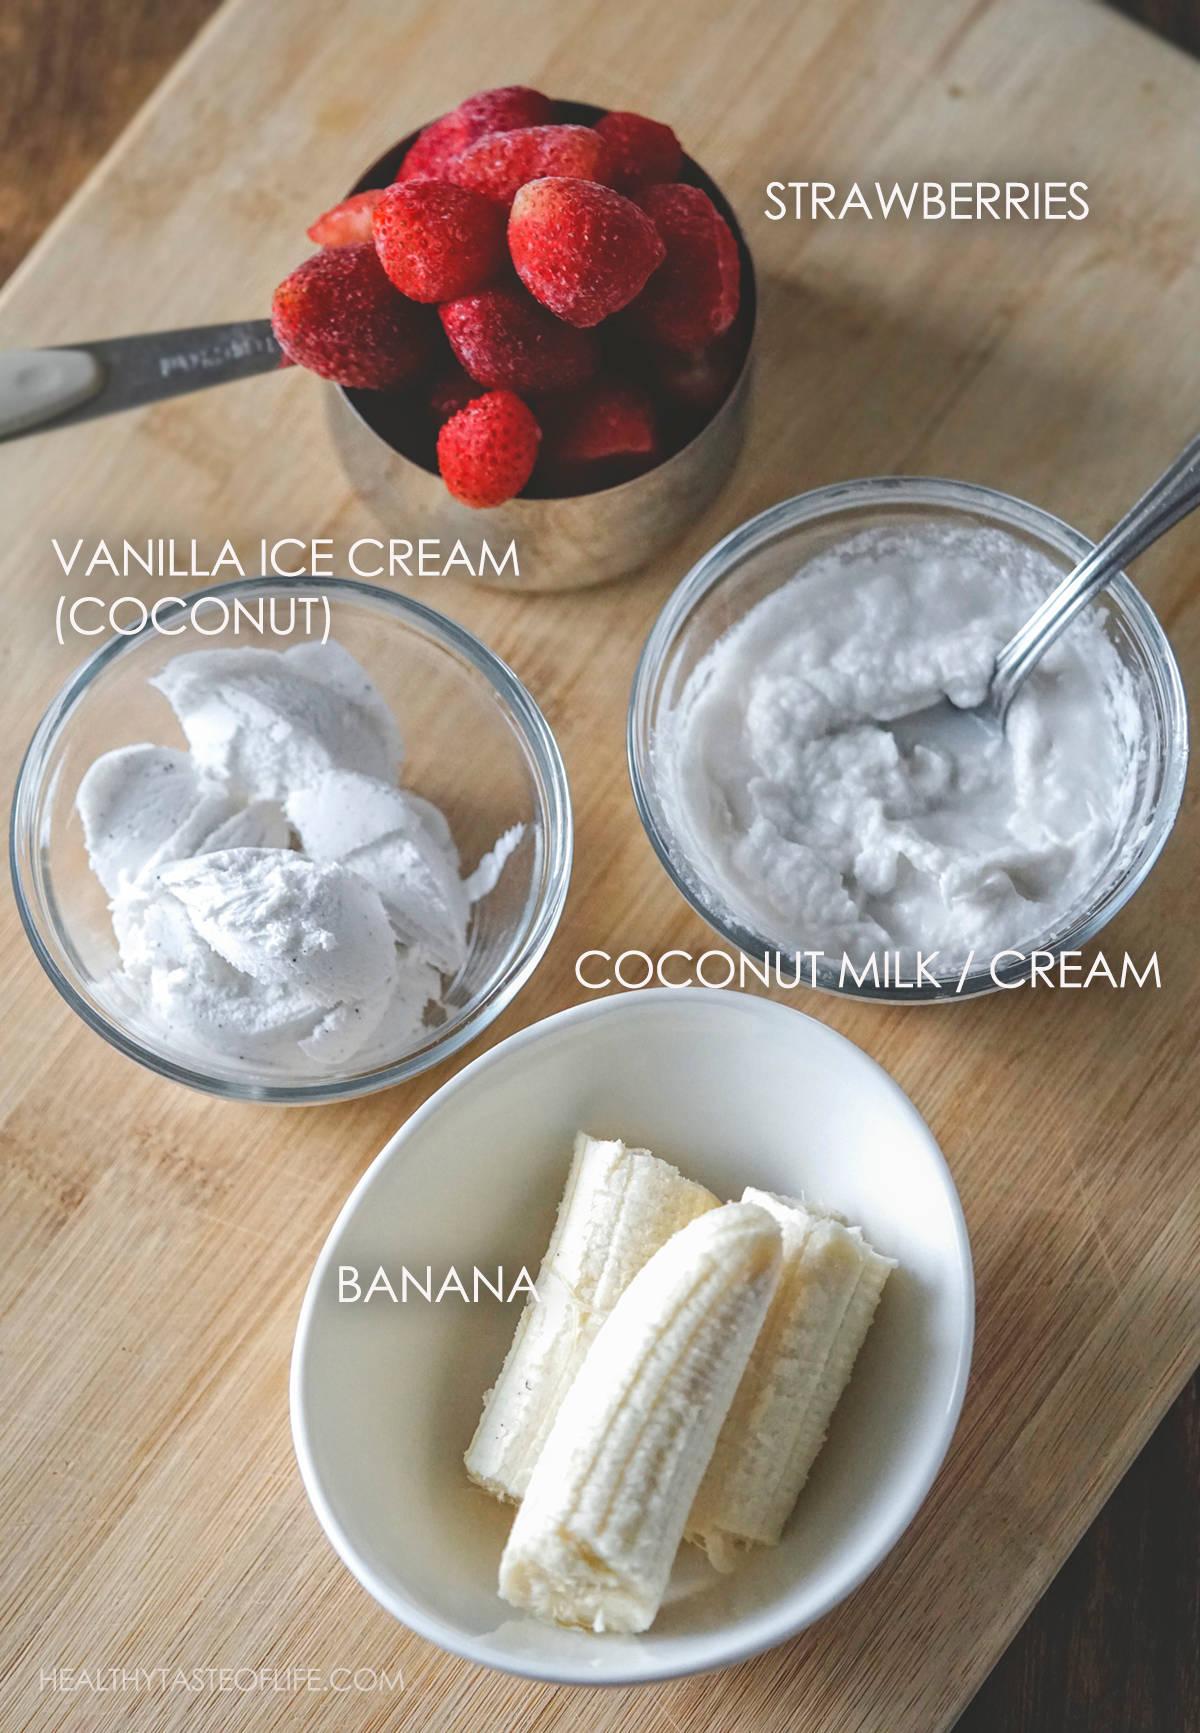 Gathered ingredients shot for a vegan strawberry banana milkshake.